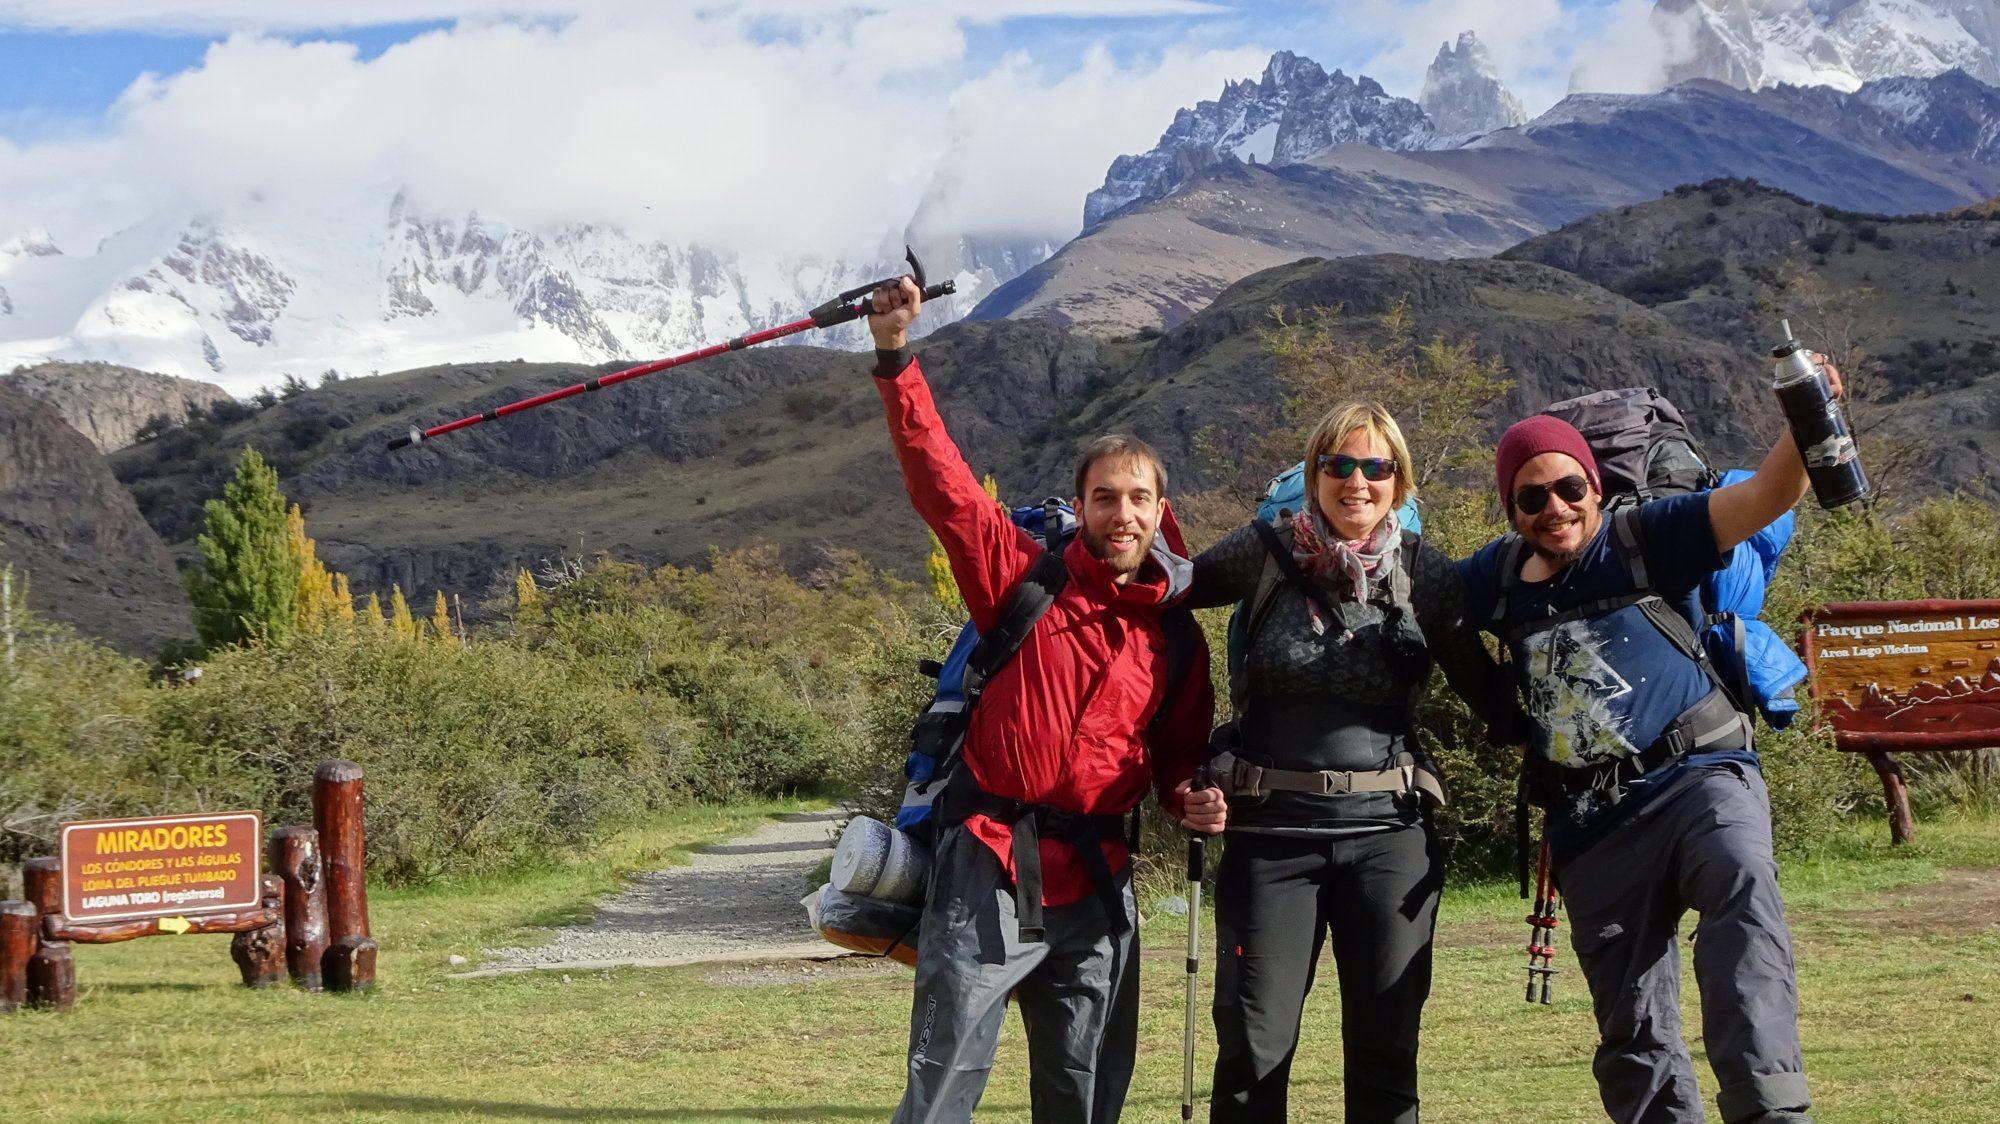 Start Huemul Circuit, Visitor Center, El Chaltén, Patagonien, Argentinien, Wanderung, Trekking